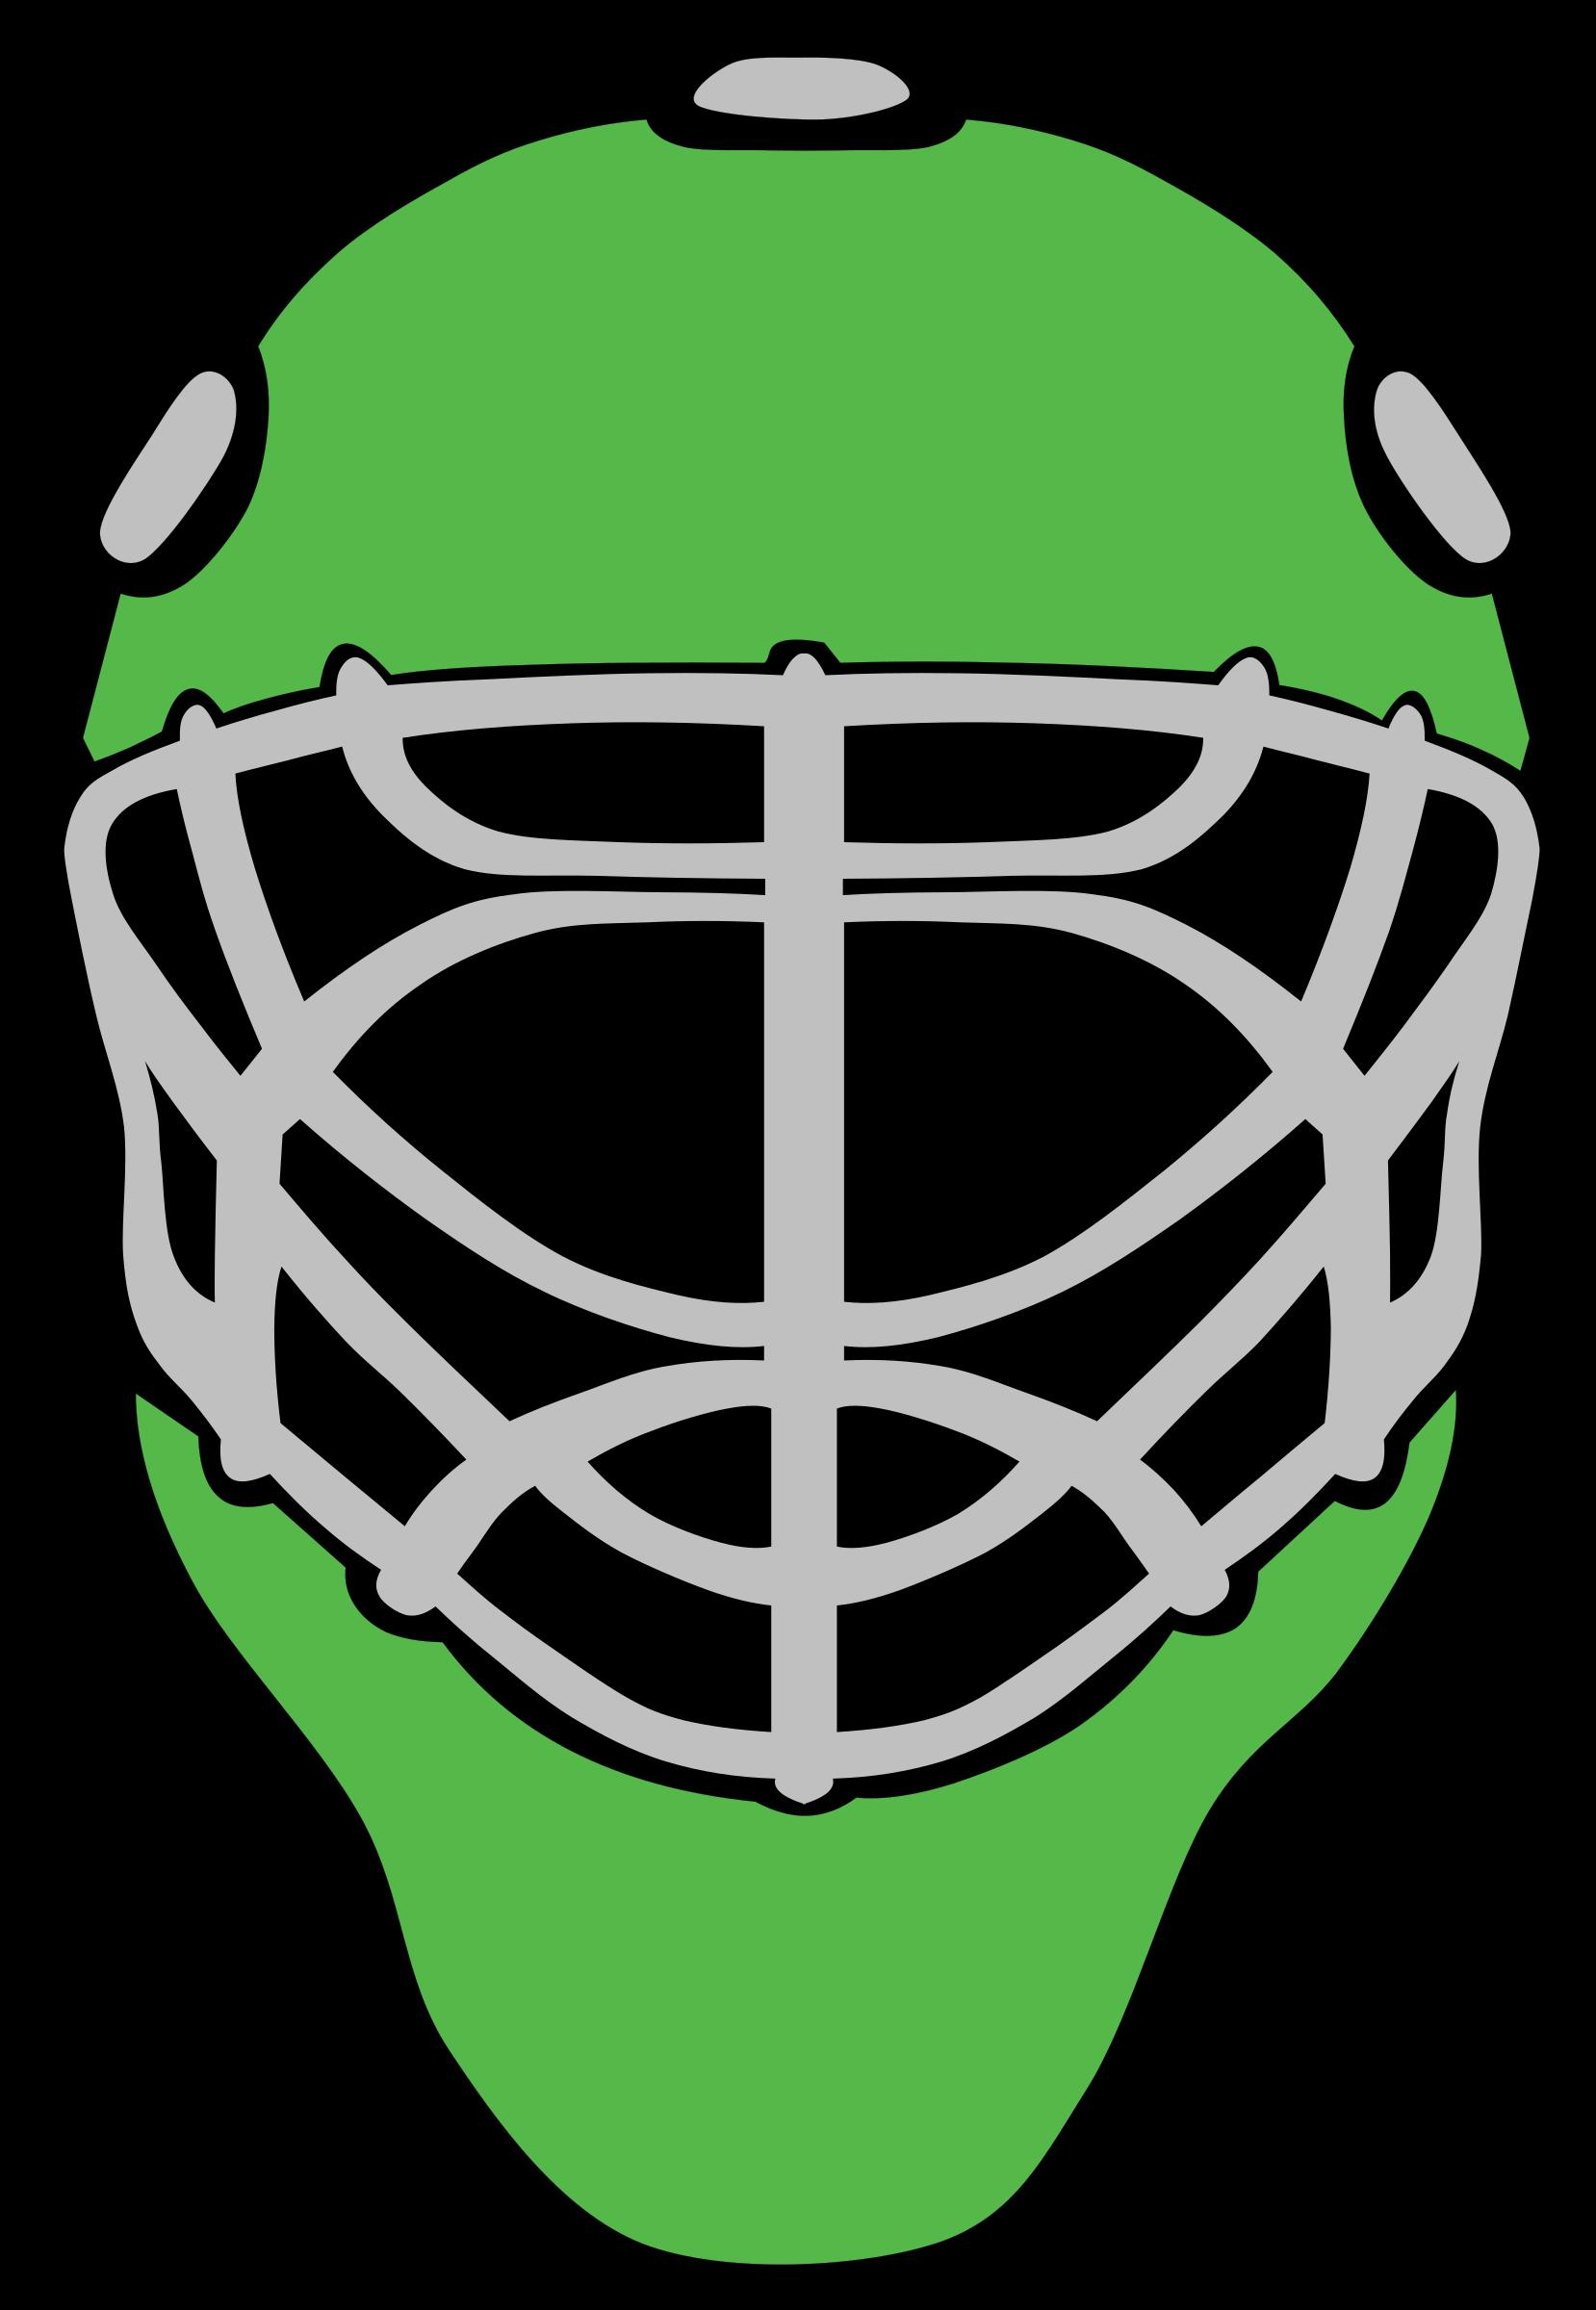 Mask clipart goalie Mask simple Goalie mask Goalie